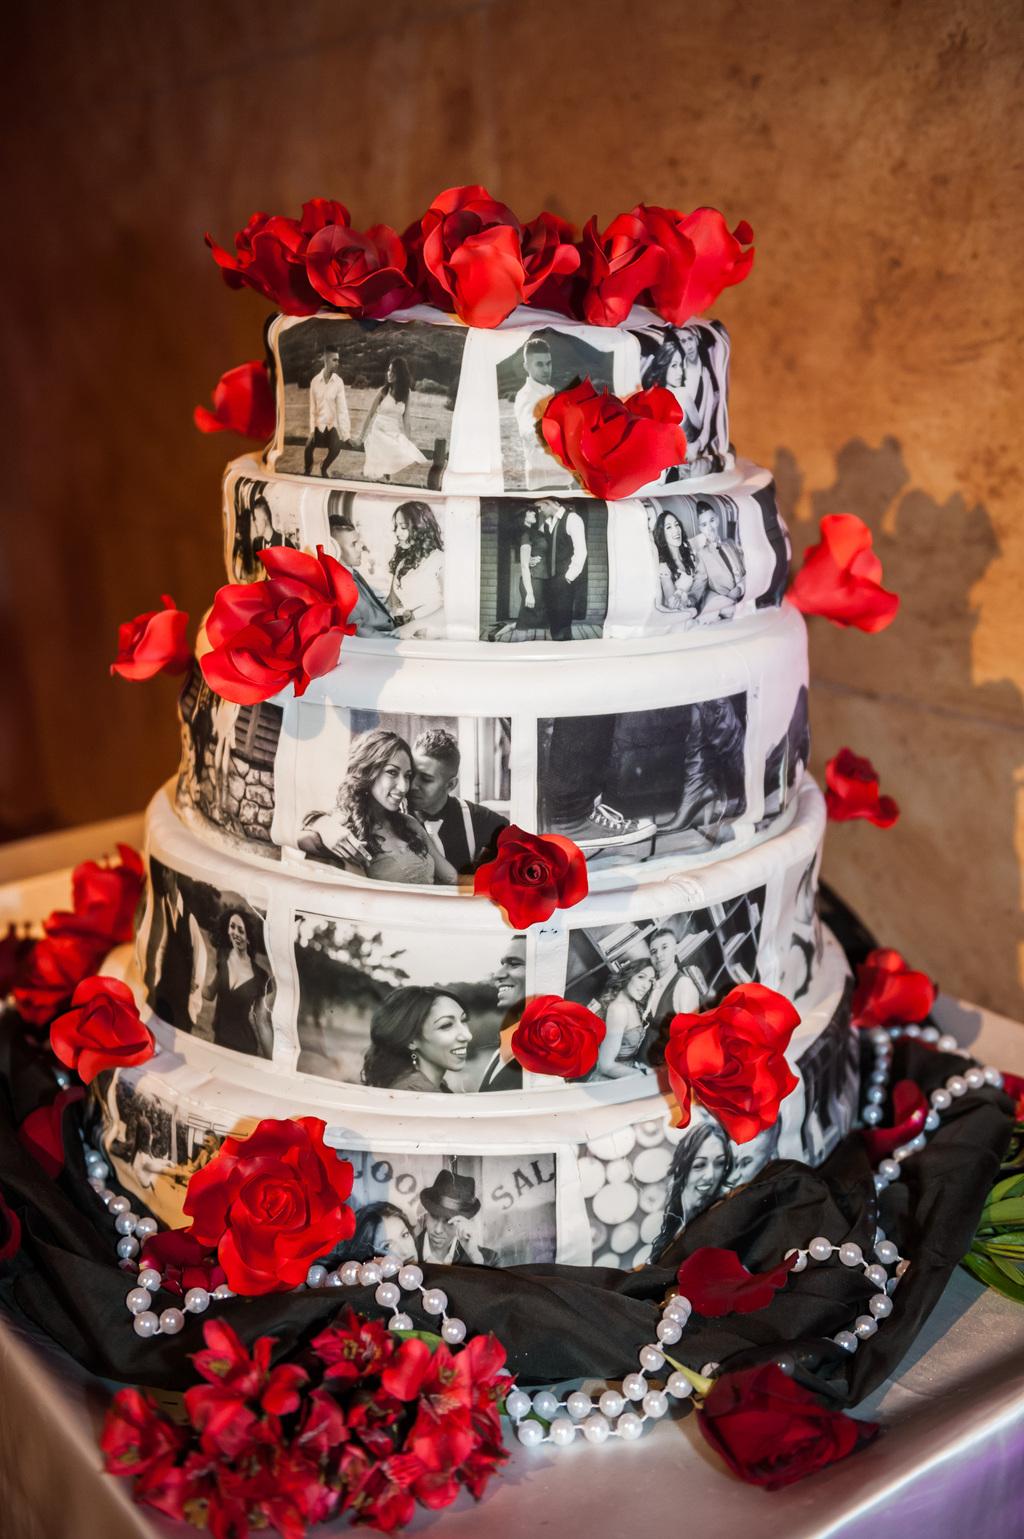 Epic-wedding-in-los-angeles-california-weddings-black-white-red-cake.full